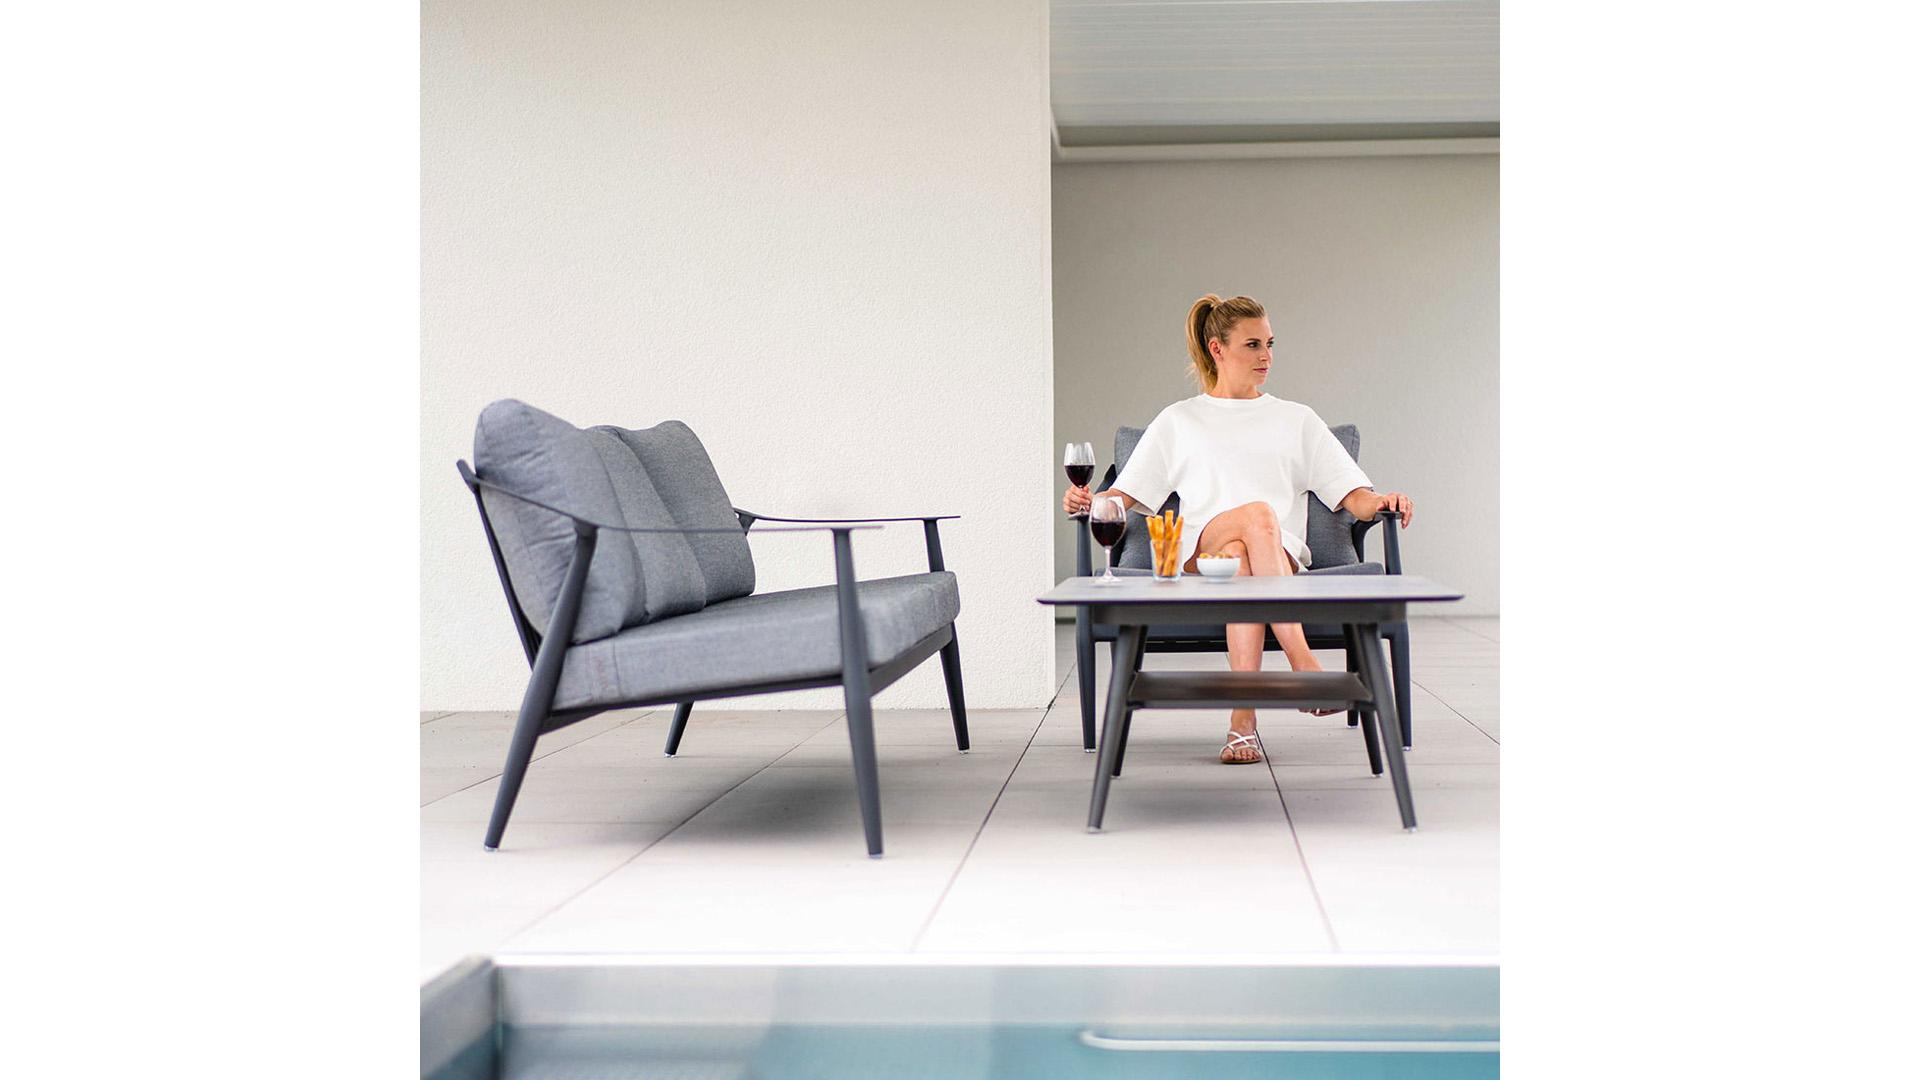 stern-vanda-3-sitzer-sofa-aluminium-outdoorstoff-1198420-9.jpg